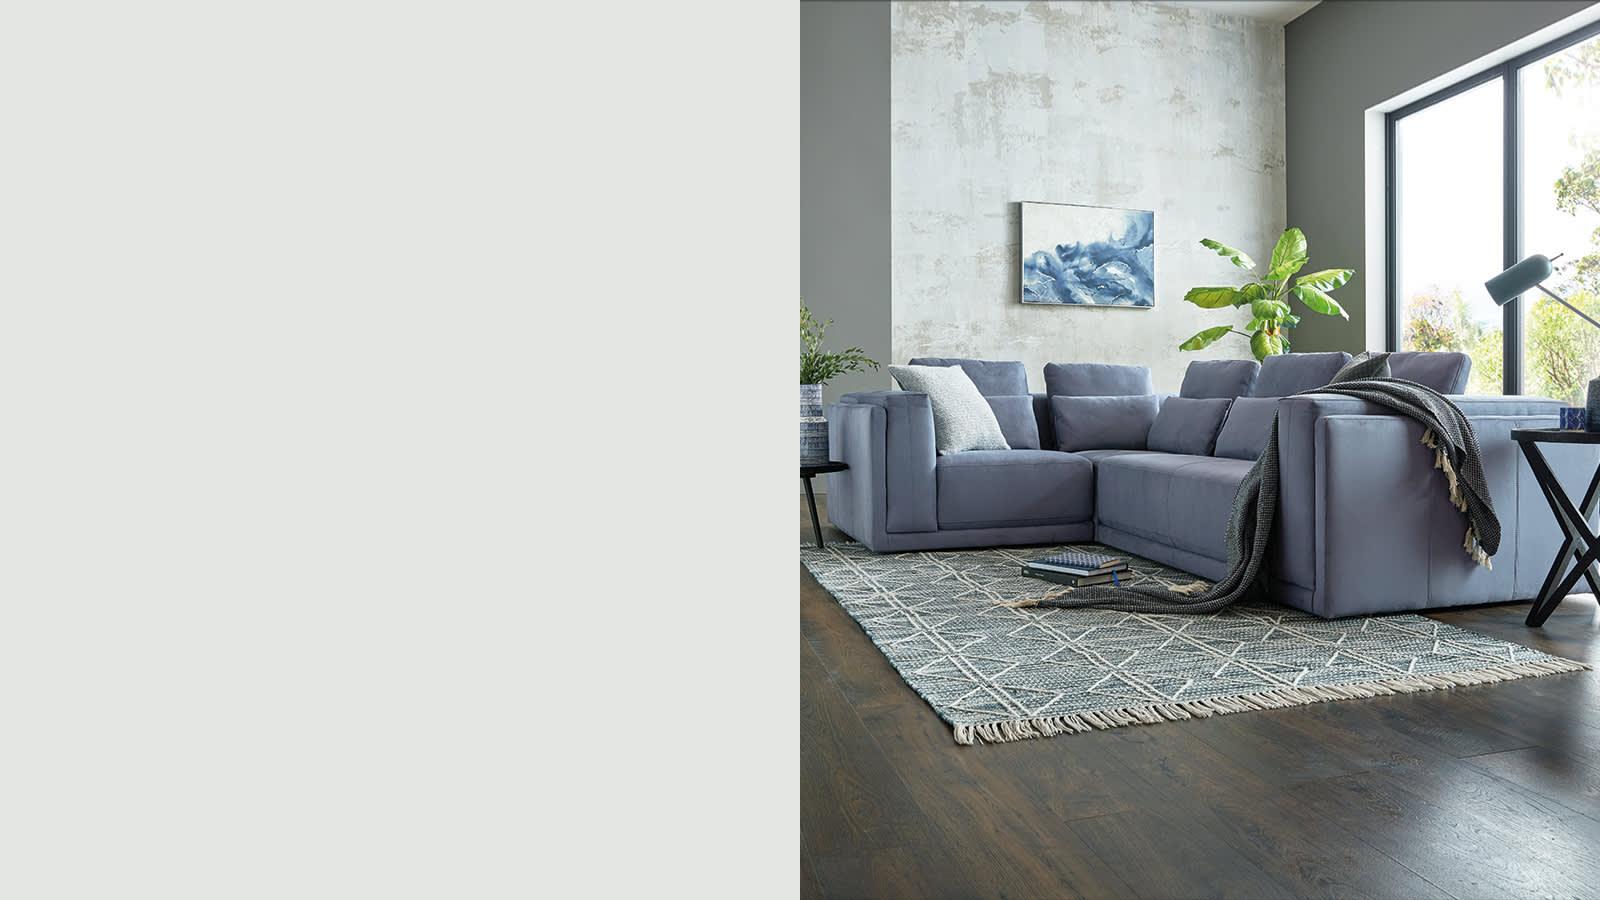 Sofology Odessy sofa